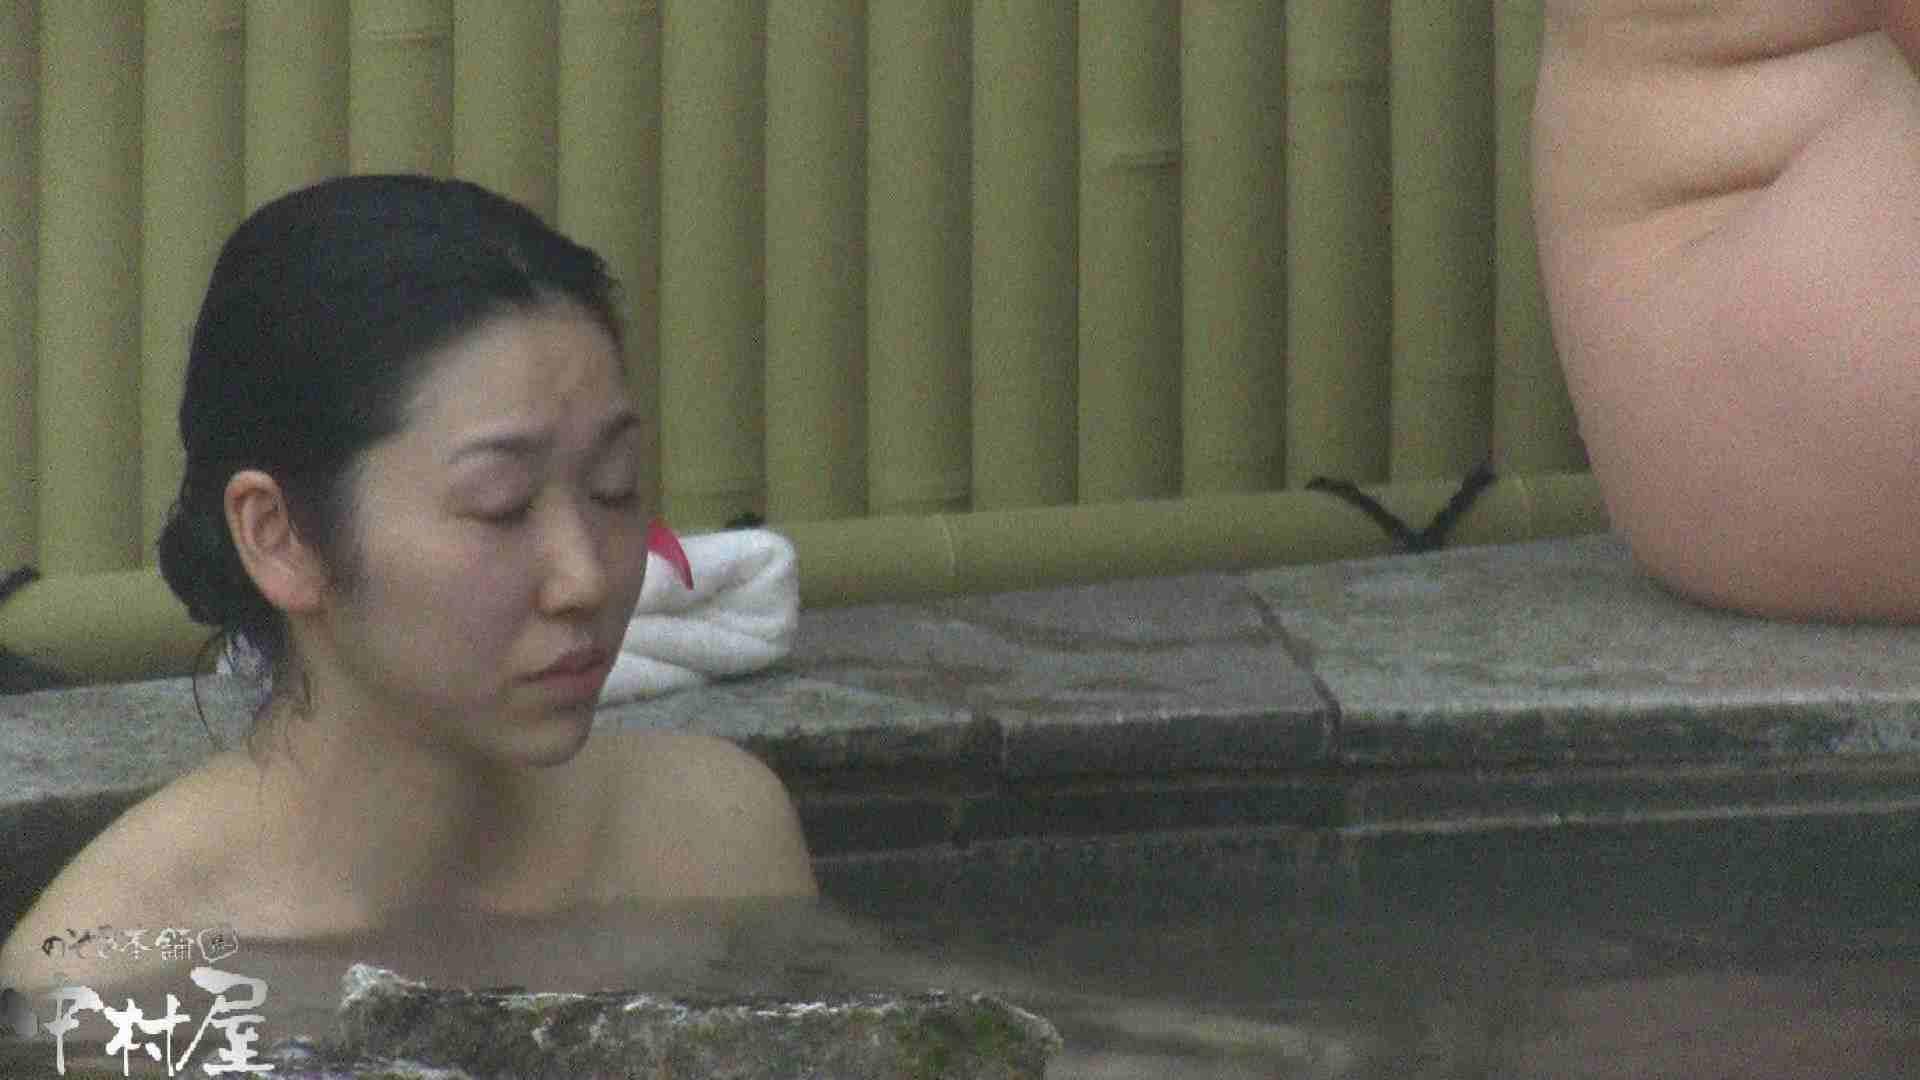 Aquaな露天風呂Vol.917 盗撮シリーズ   露天風呂編  108PIX 41